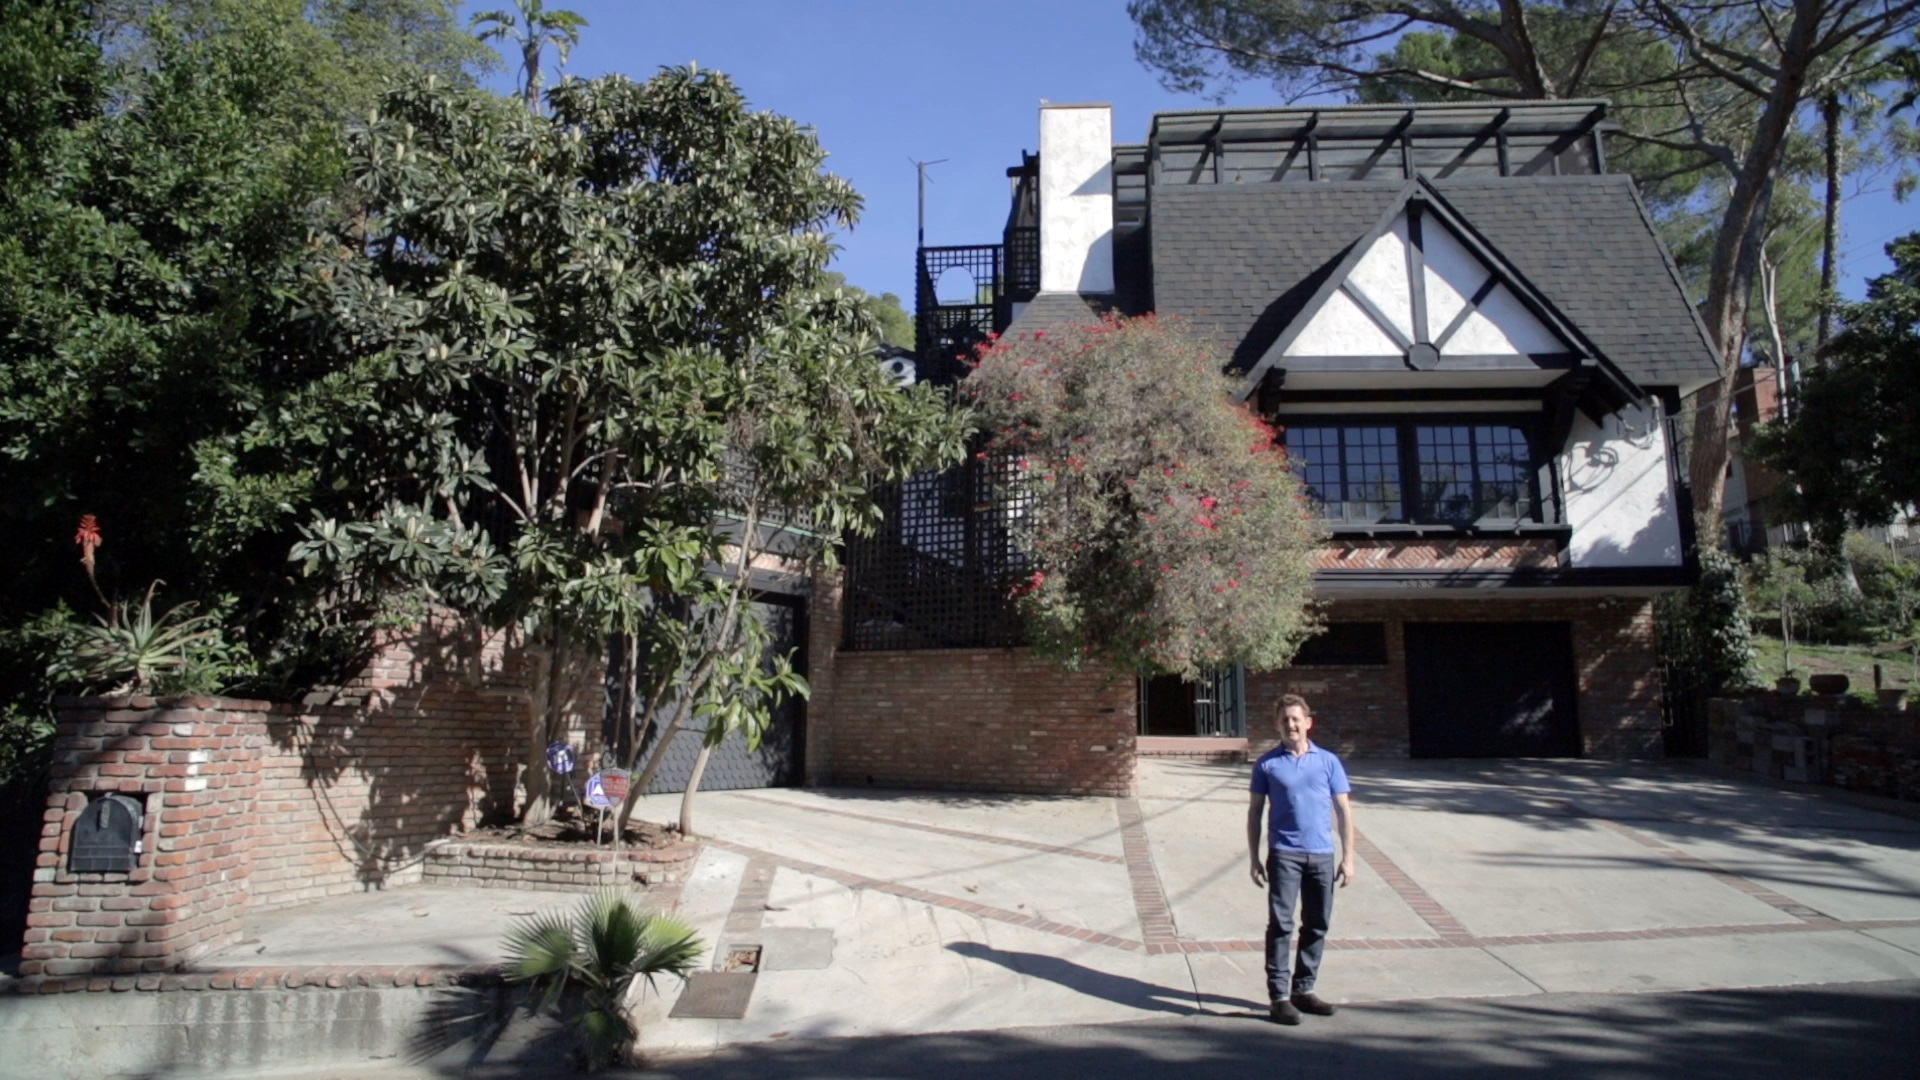 Freak out buy frank zappas house for 9 million cbs news for The laurel house